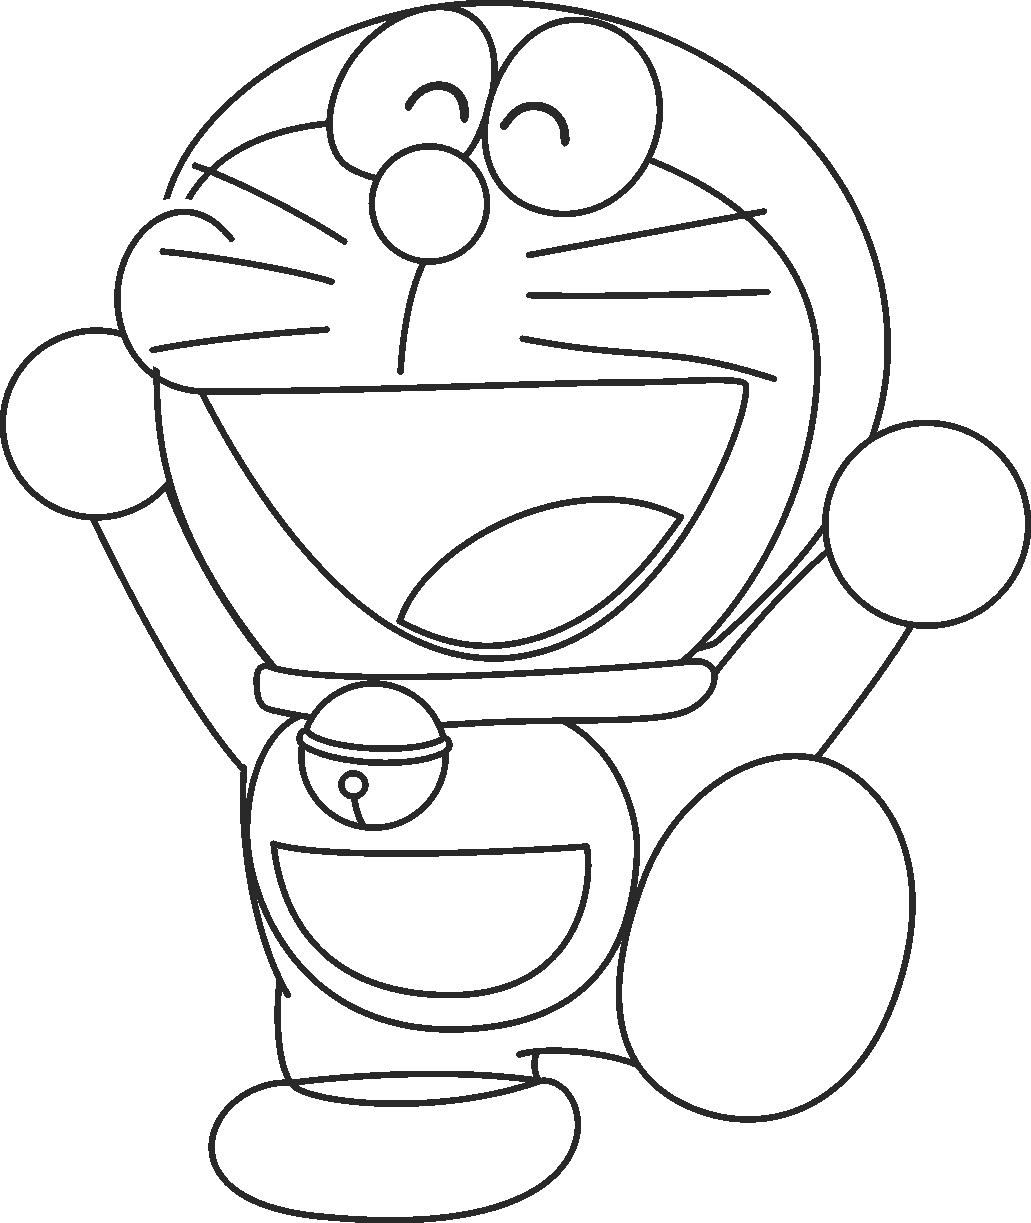 38 Coloring Page Doraemon Coloring Book Download Coloring Books Coloring Pages For Kids